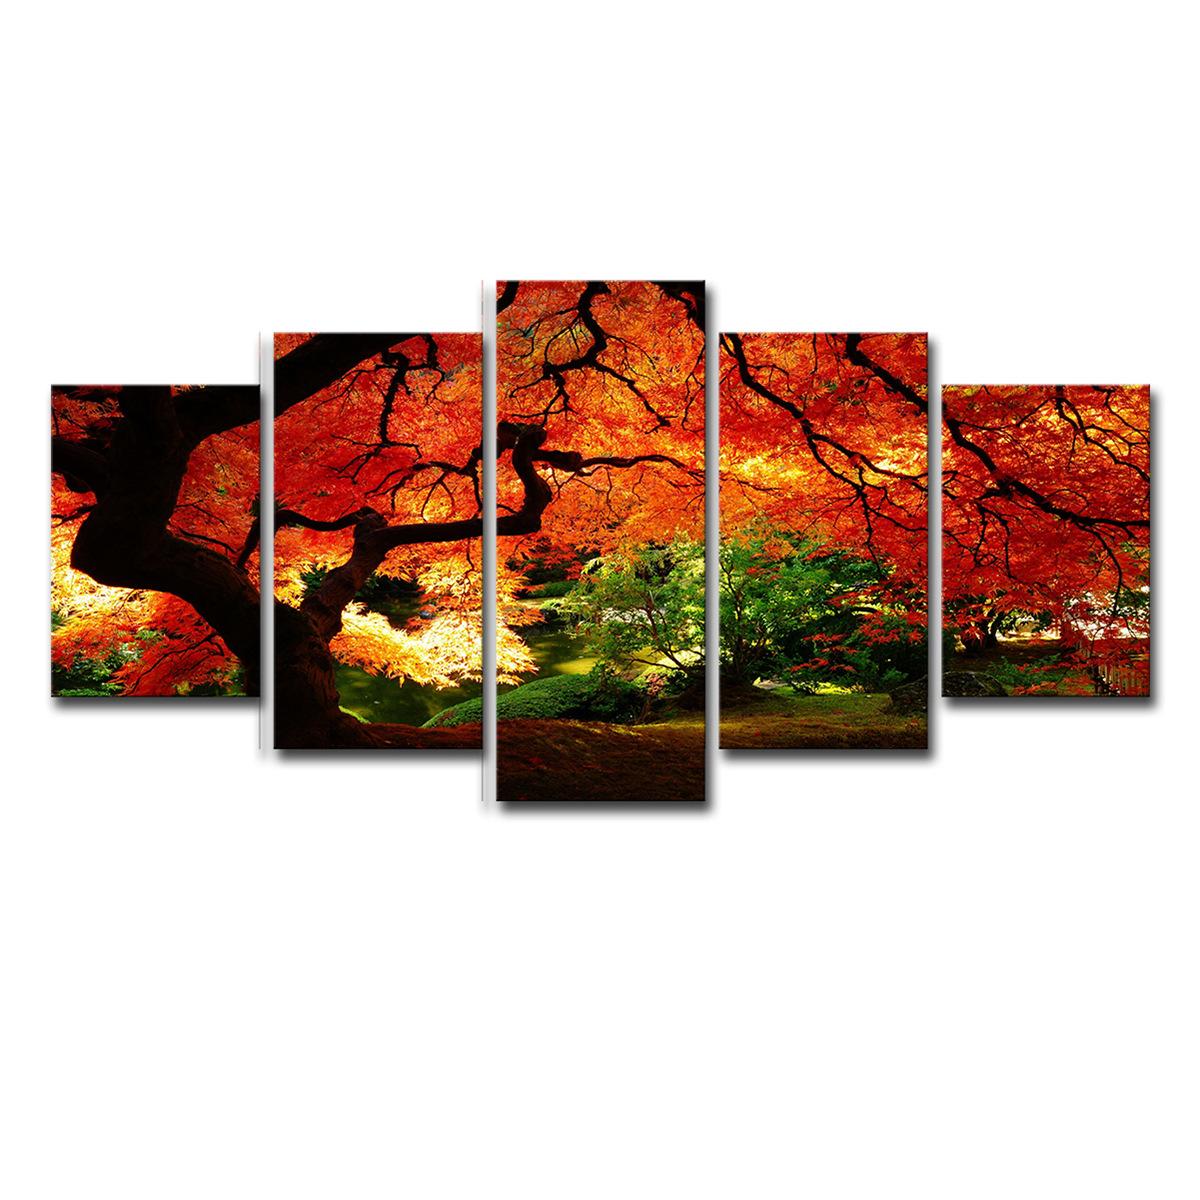 Rabatt Herbst Baum Wand Kunst 2020 Herbst Baum Wand Kunst Im Angebot Auf De Dhgate Com